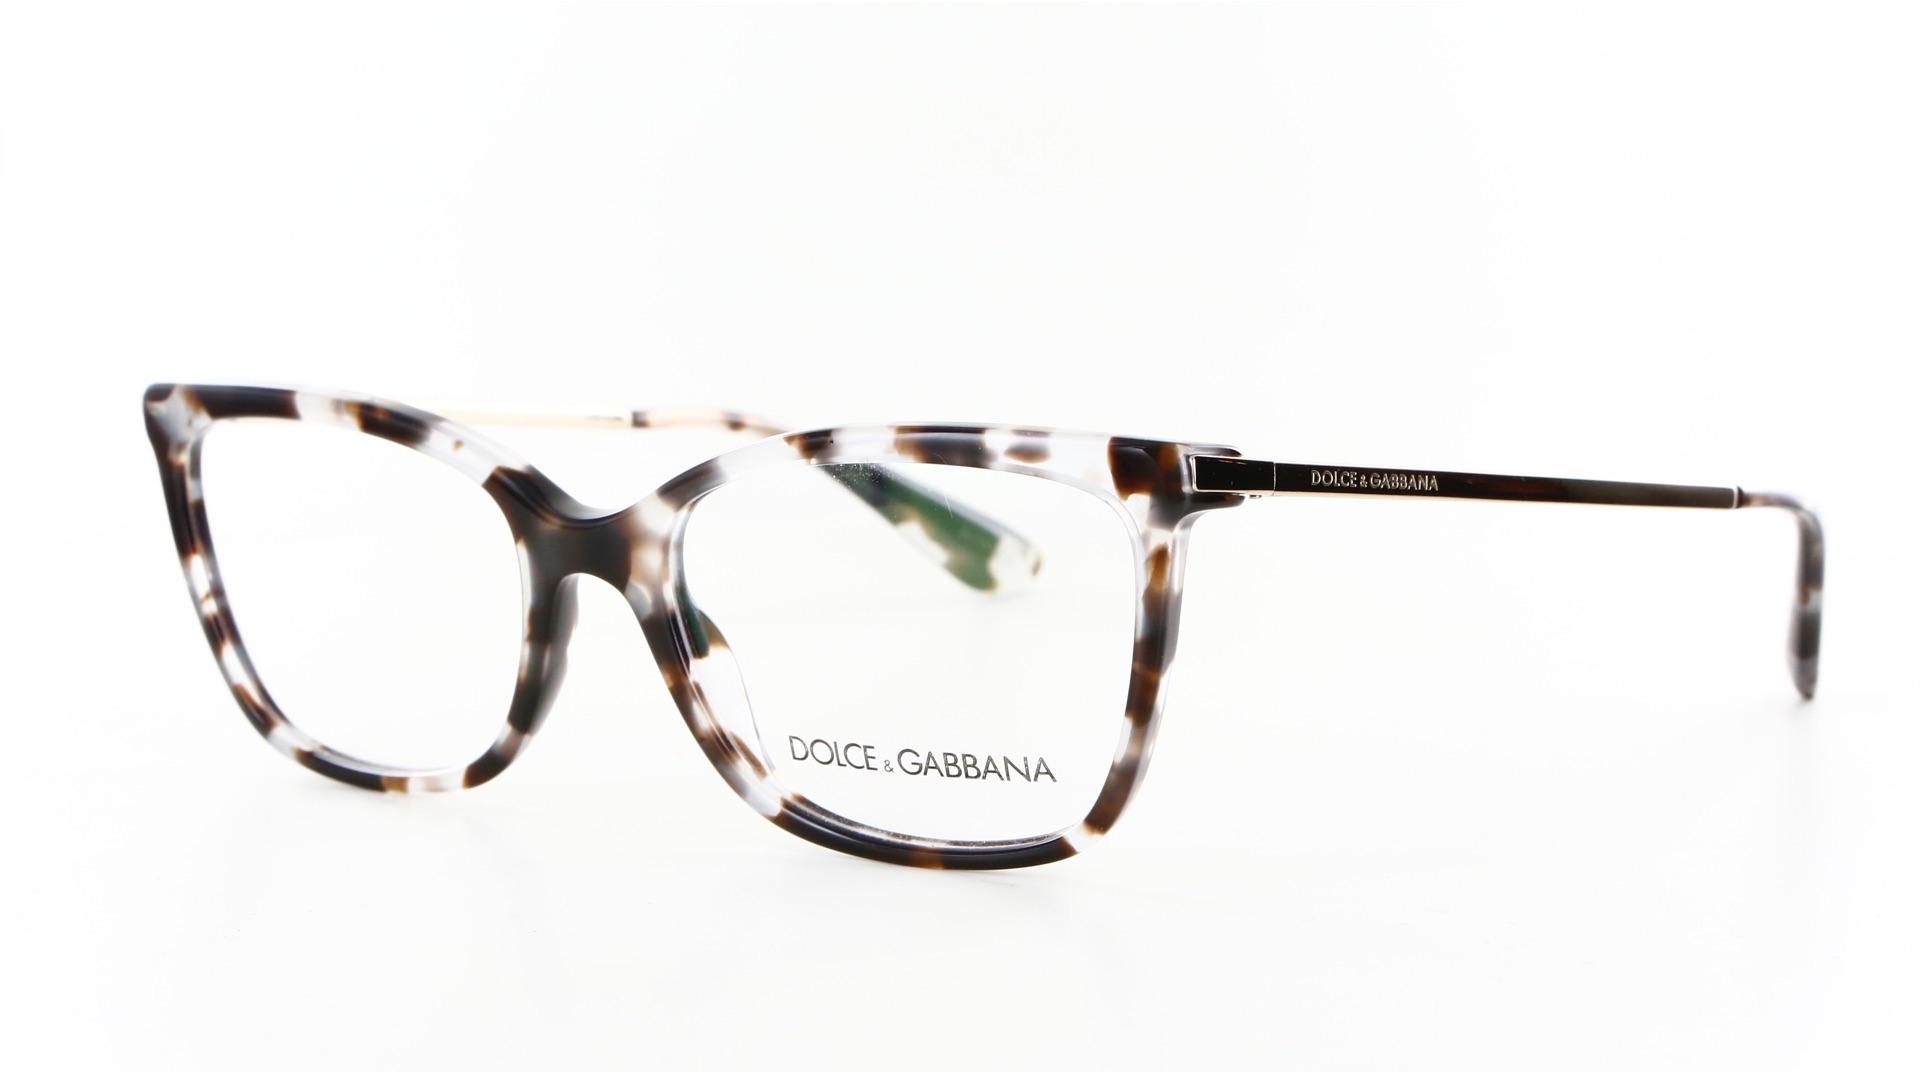 74380 | Dolce & Gabbana Frames | Claeyssens Optic | Brugge & Gent